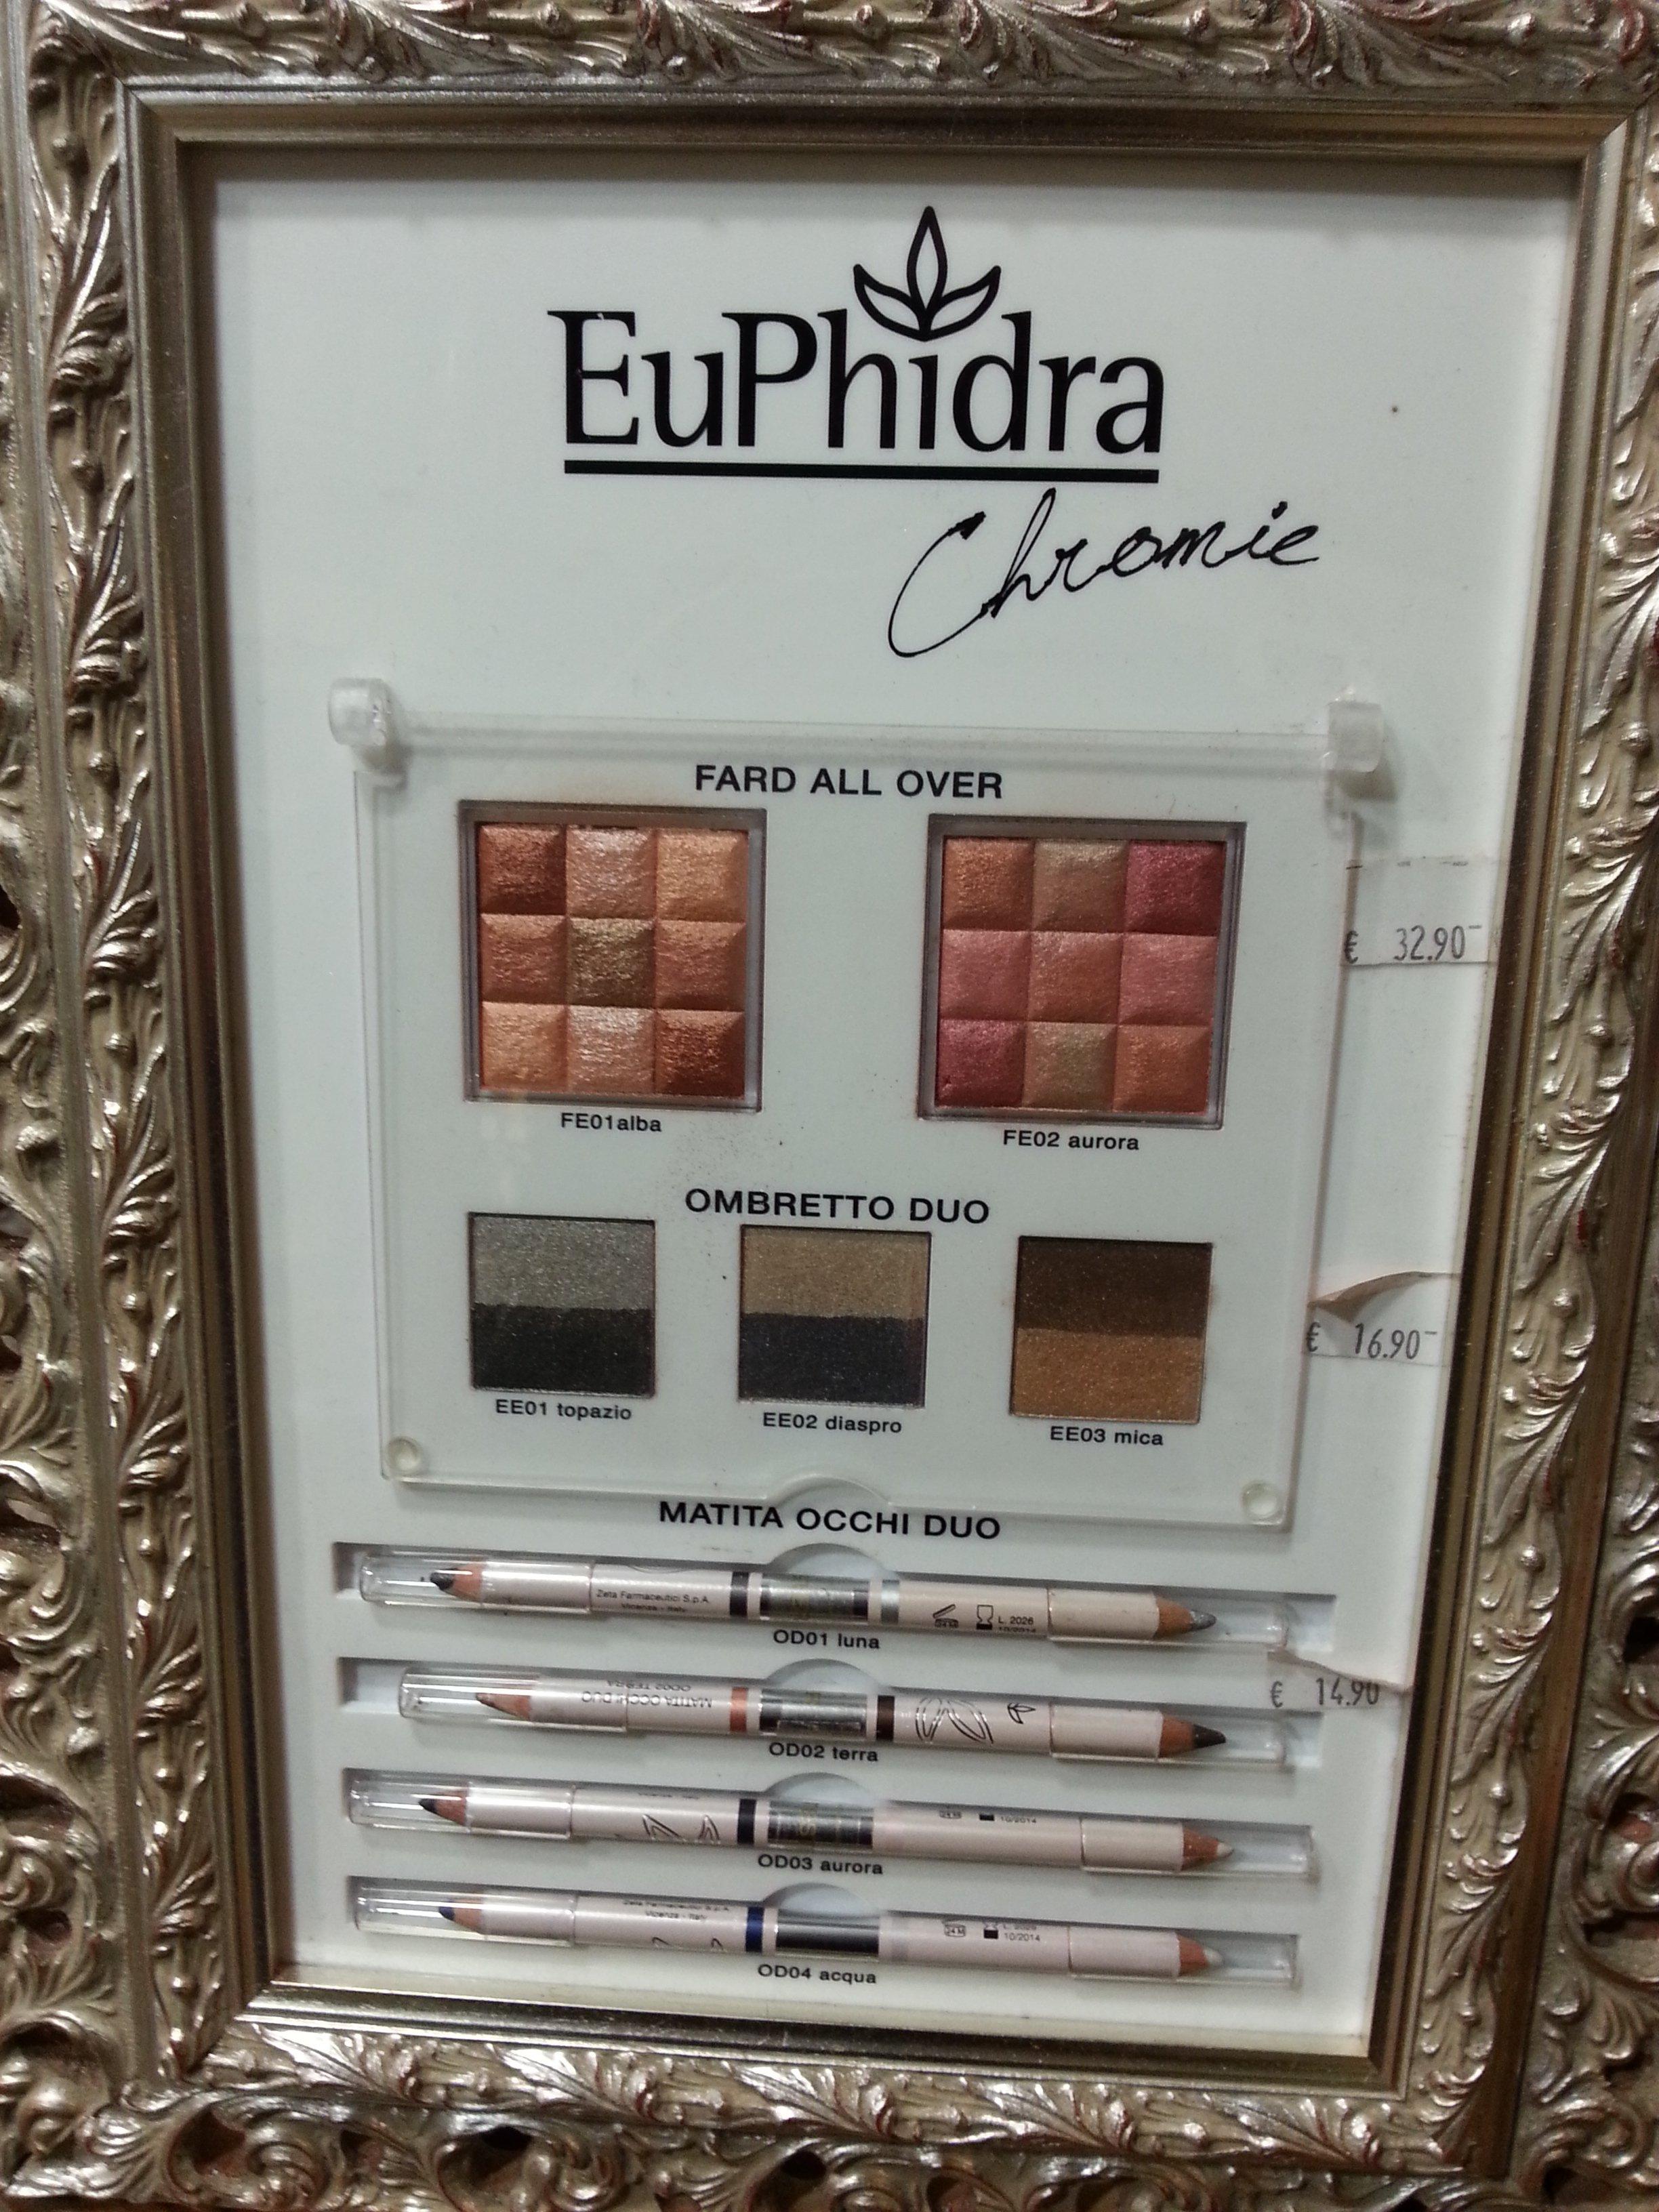 trucco a marchio EUPHIDRA